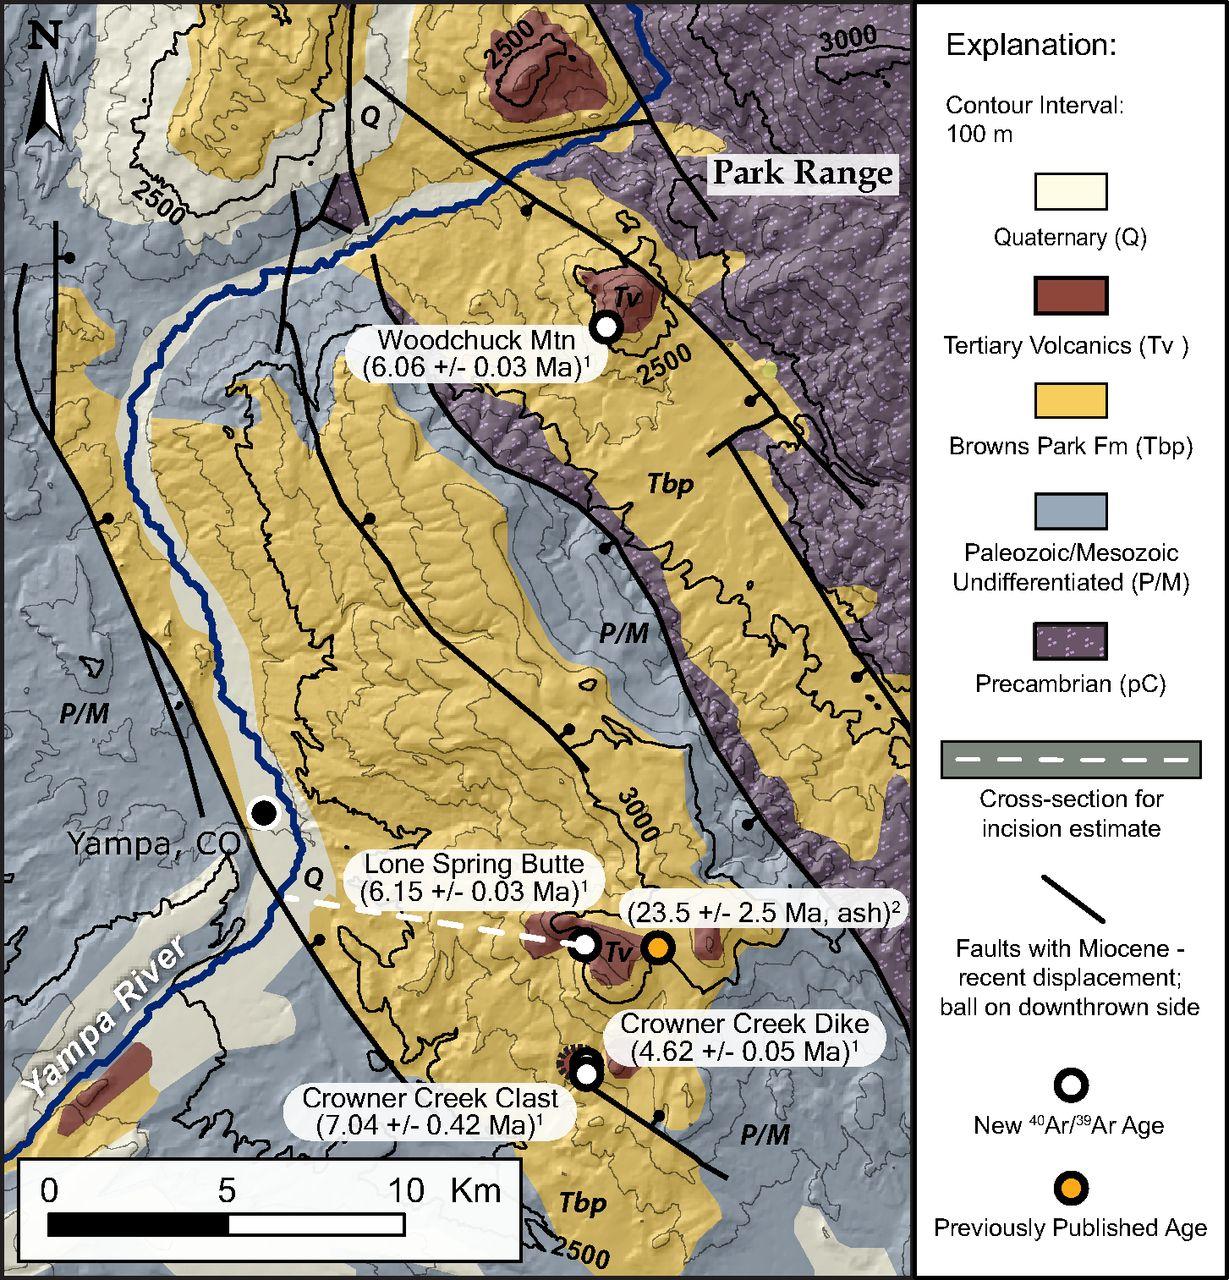 view largedownload slide simplified geologic map